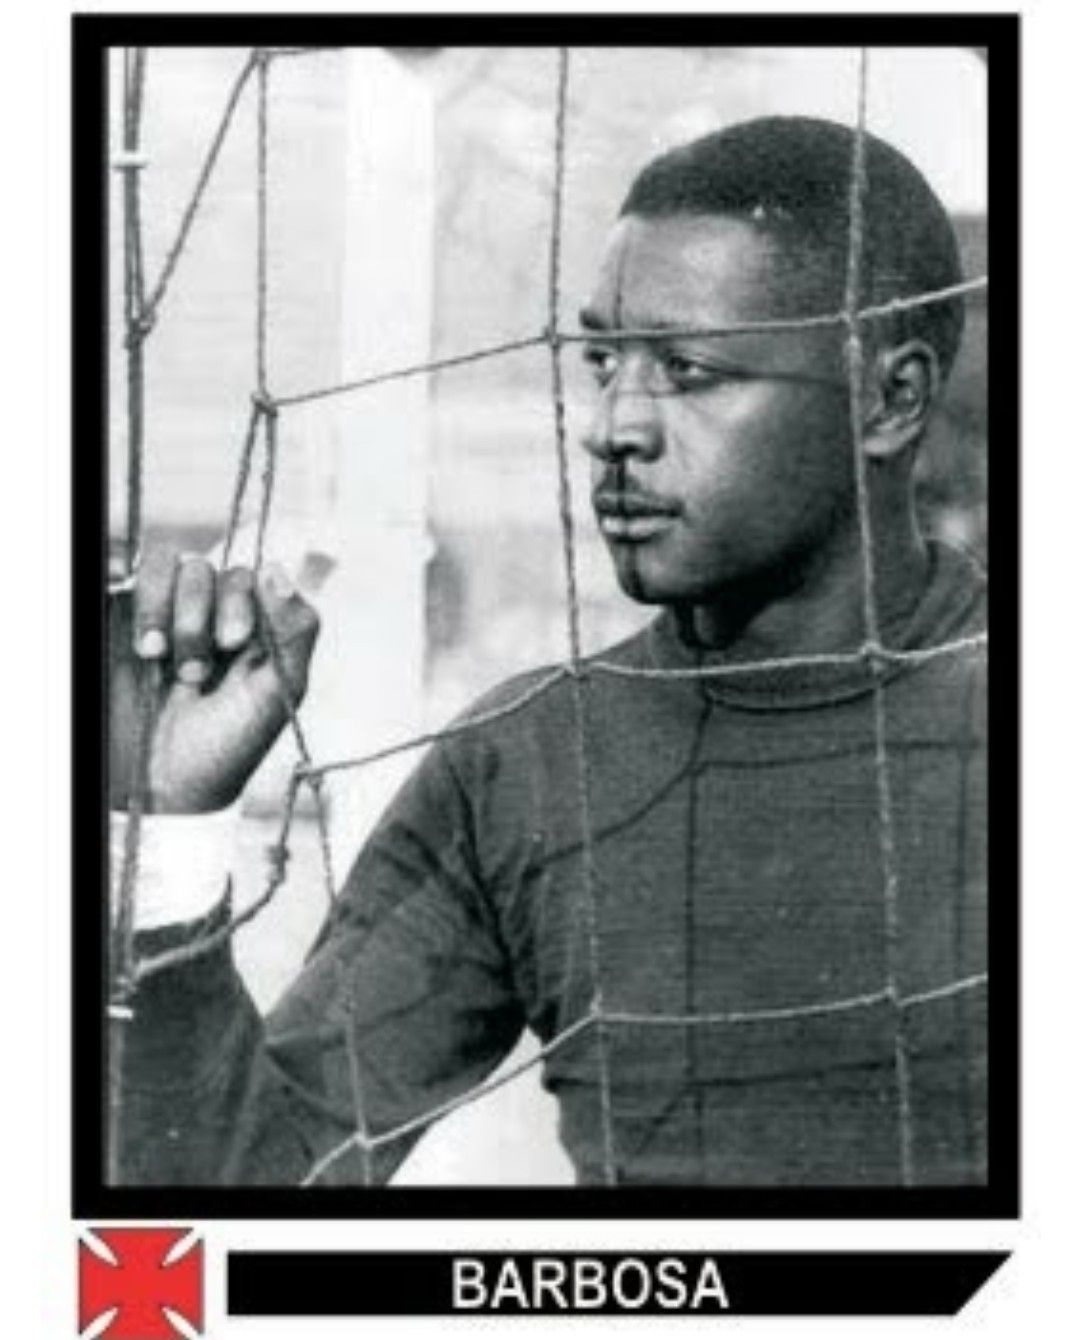 Porteros legendarios: Moacir Barbosa, el hombre que murió dos veces